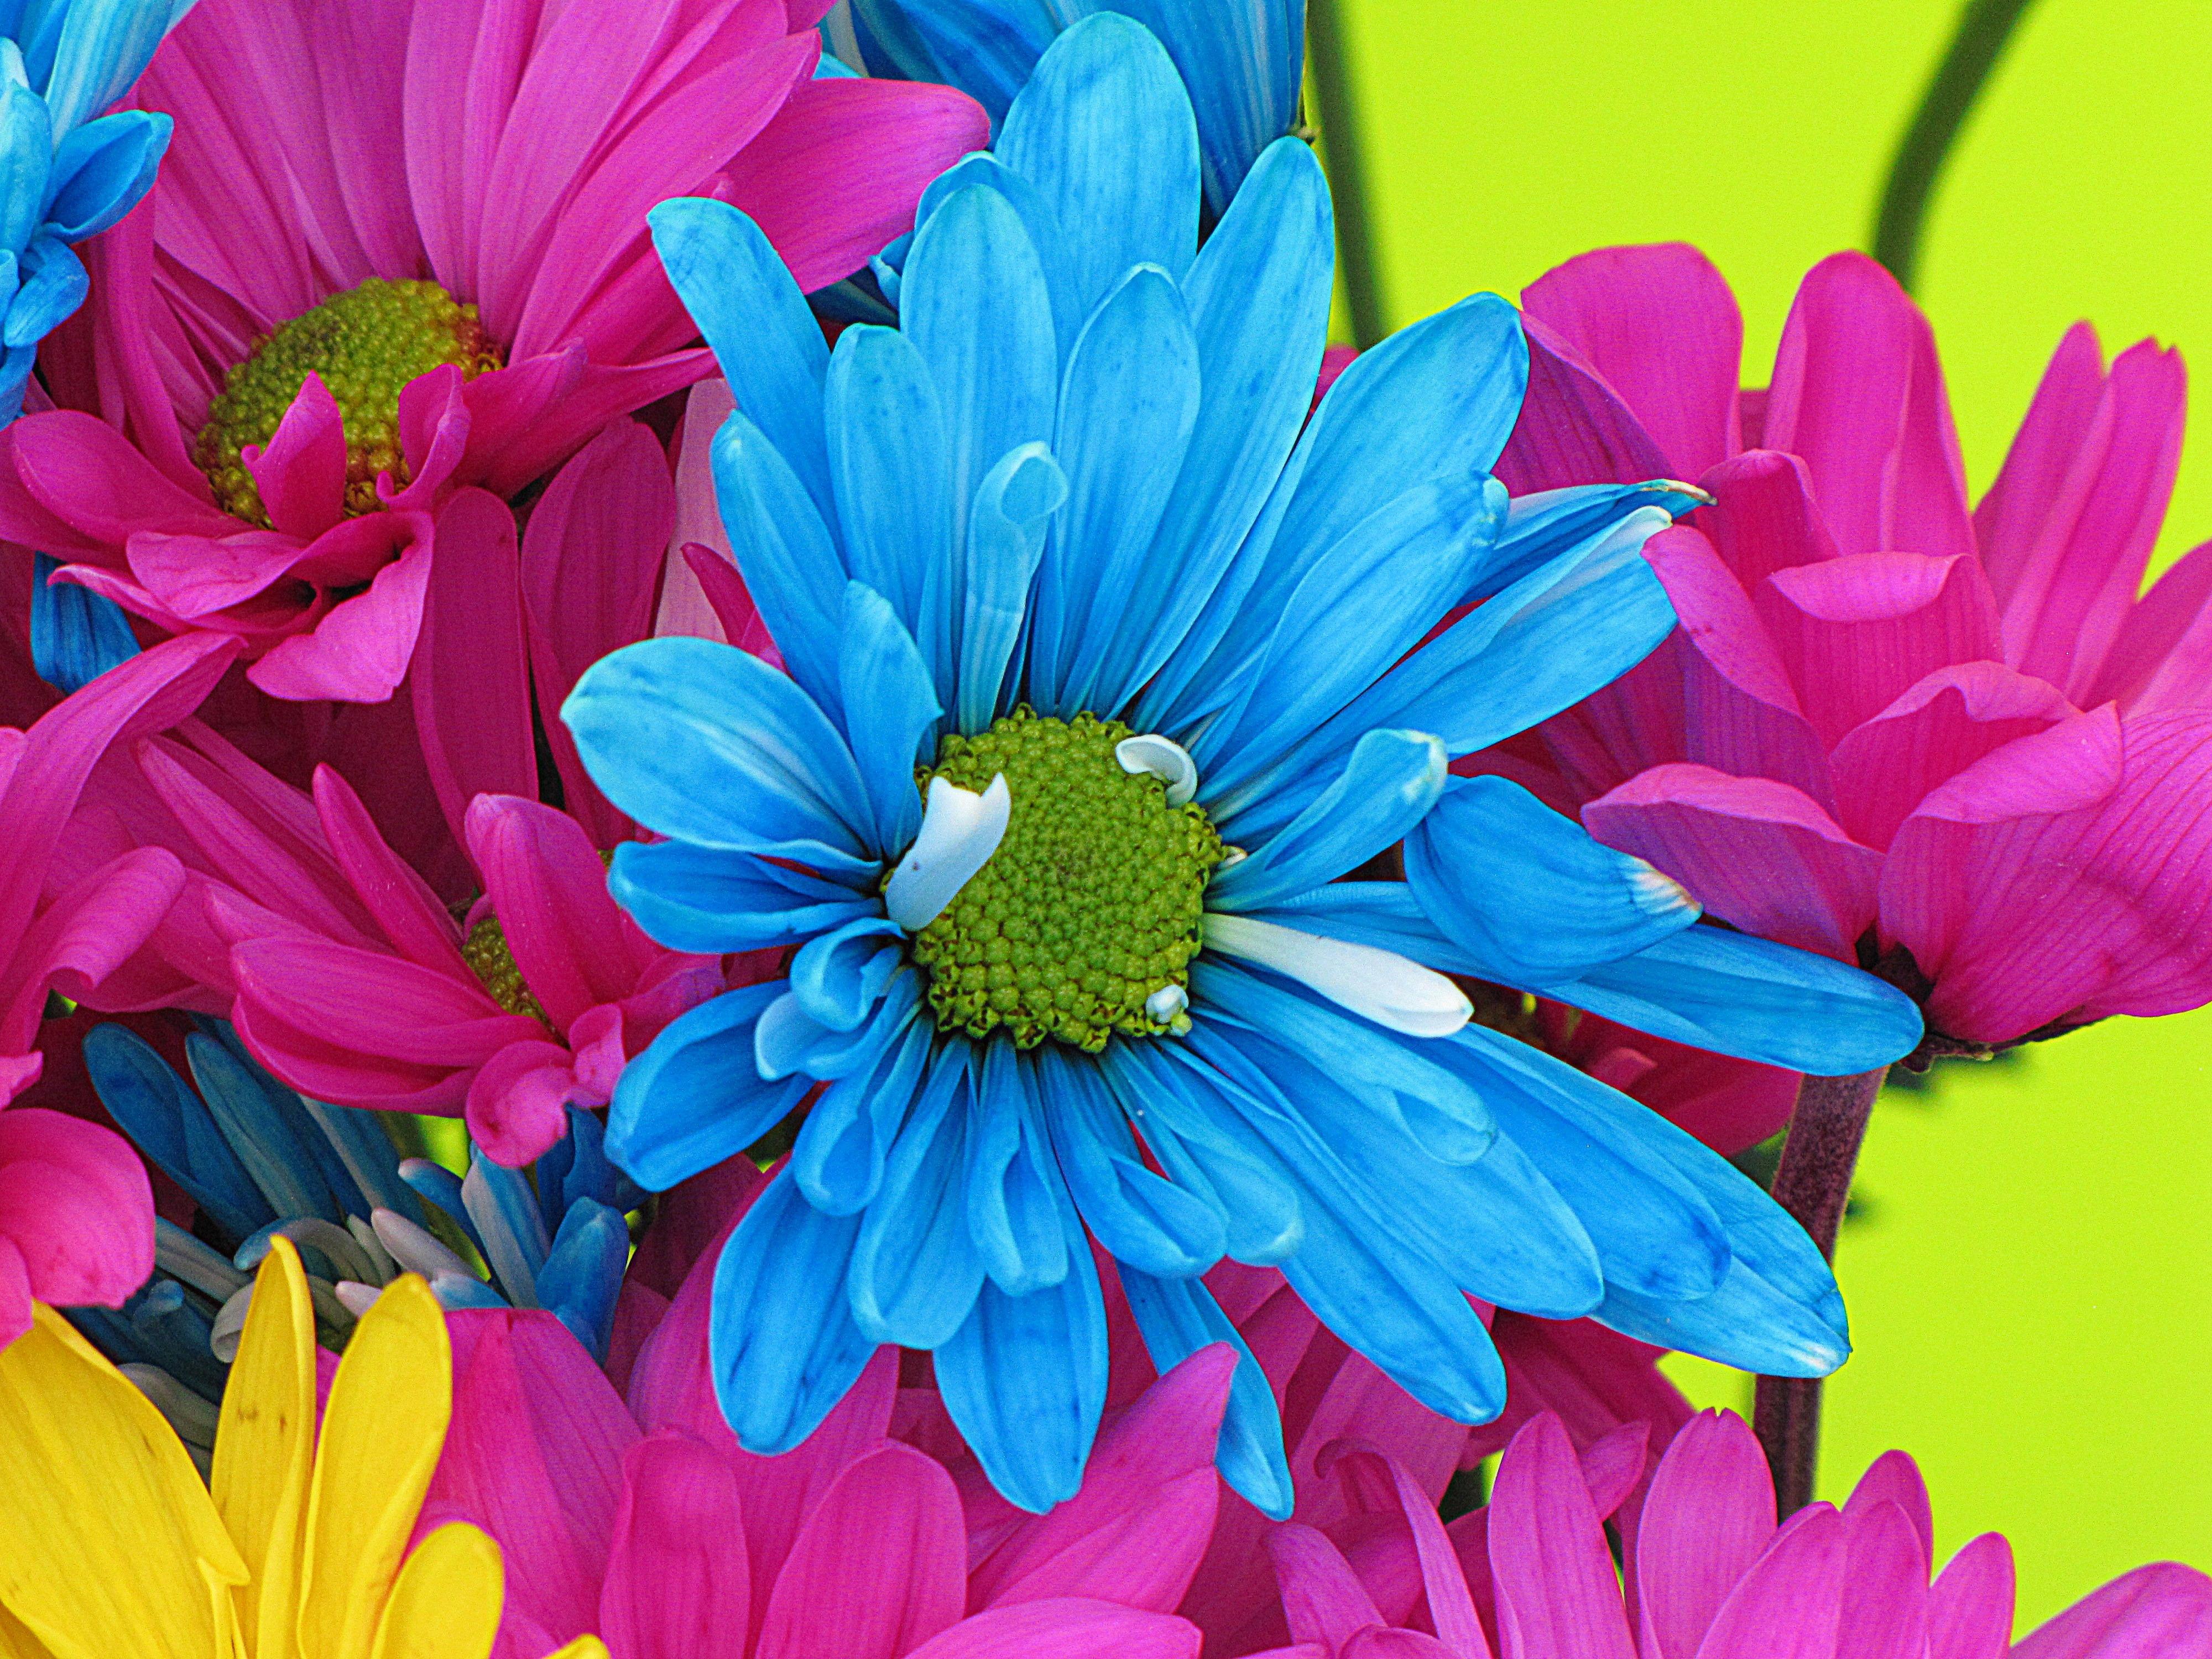 Free Images Nature Petal Bloom Blue Colorful Pink Flora